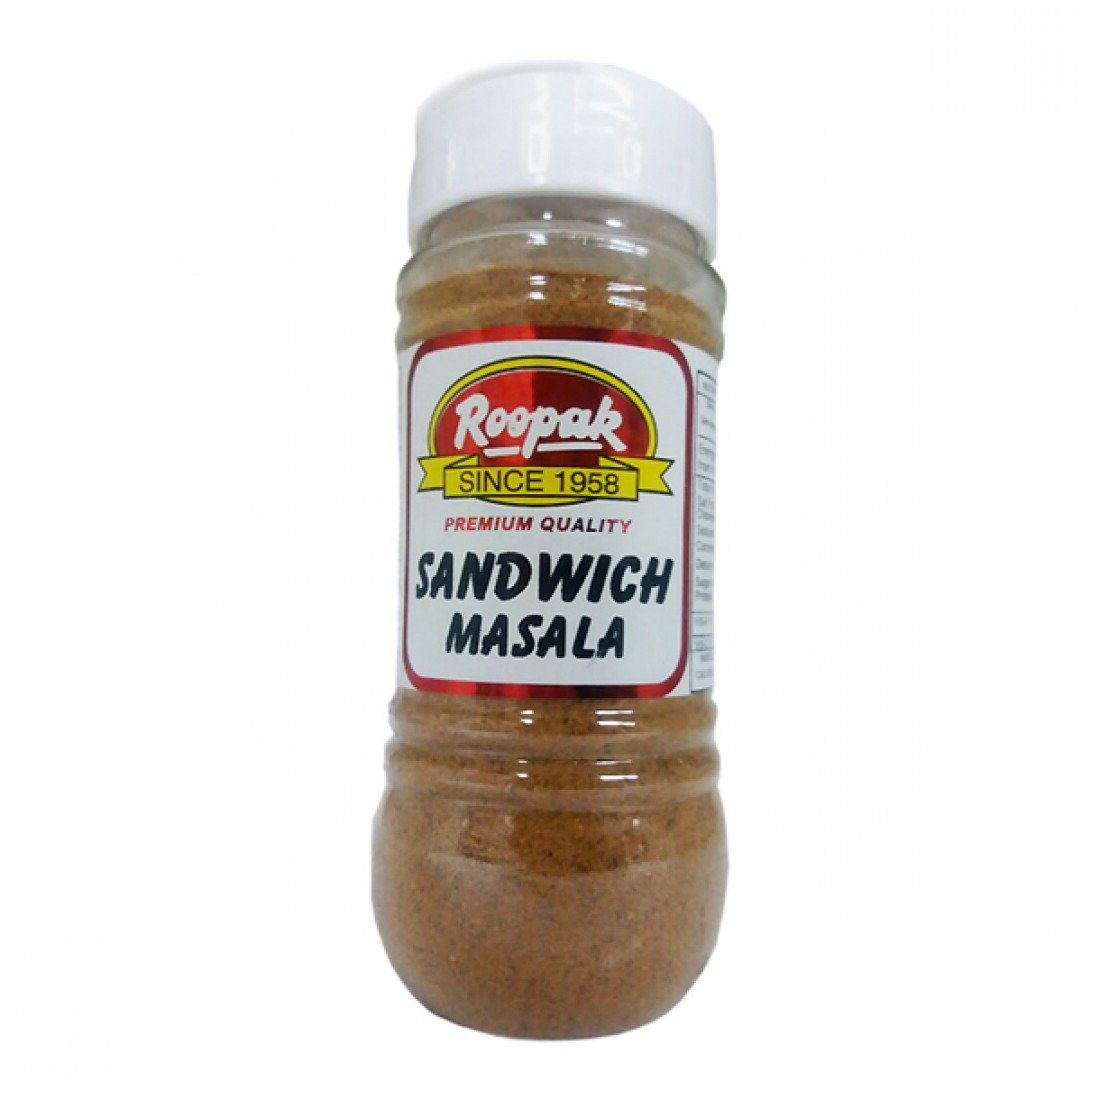 Roopak Quality inspection Delhi Sandwich Masala Indian Seasoning Spice - 1 Popular overseas Powder